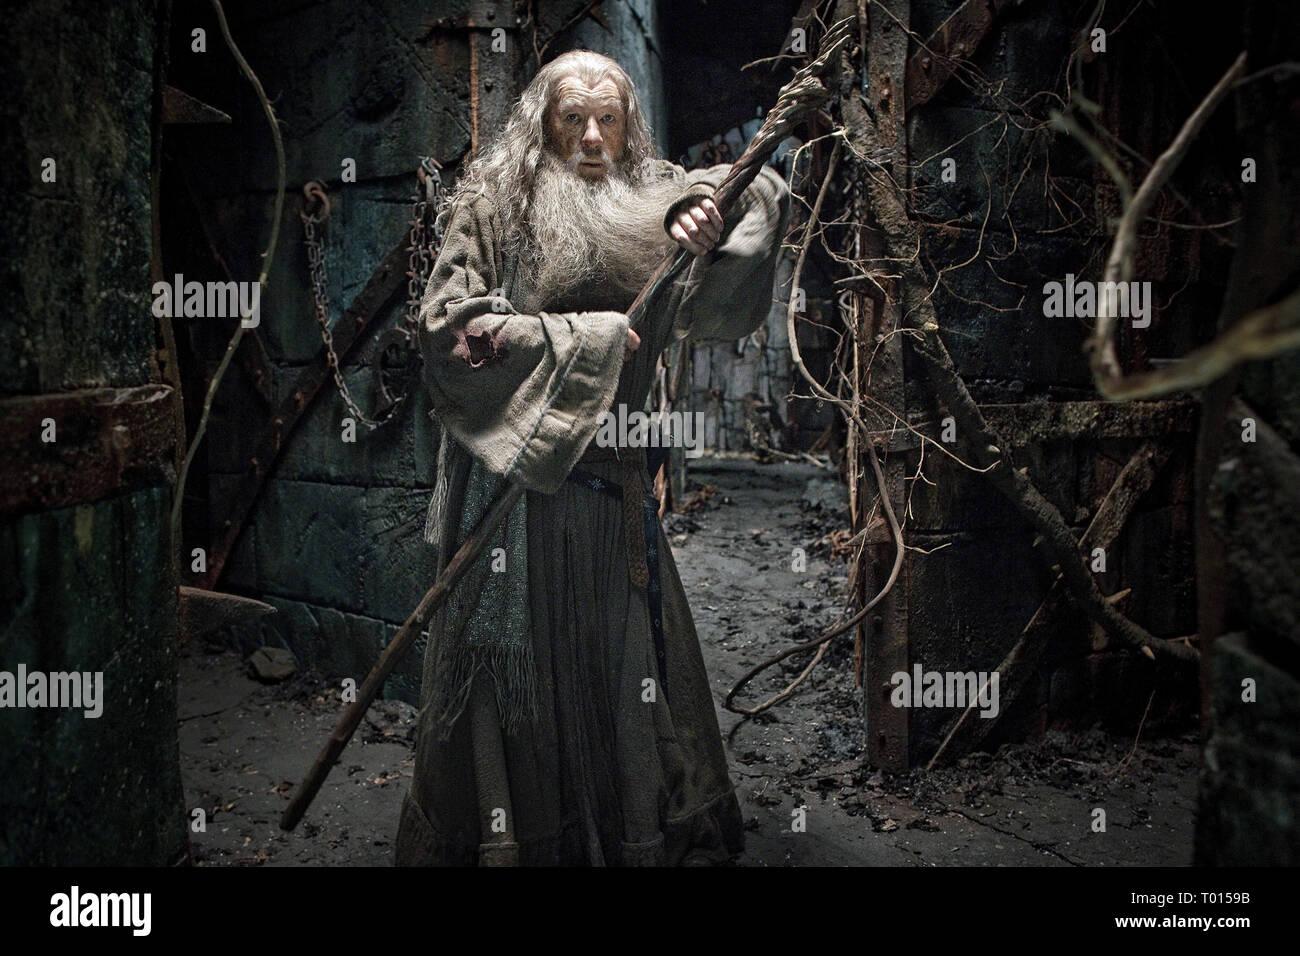 Ian Mckellen The Hobbit The Desolation Of Smaug 2013